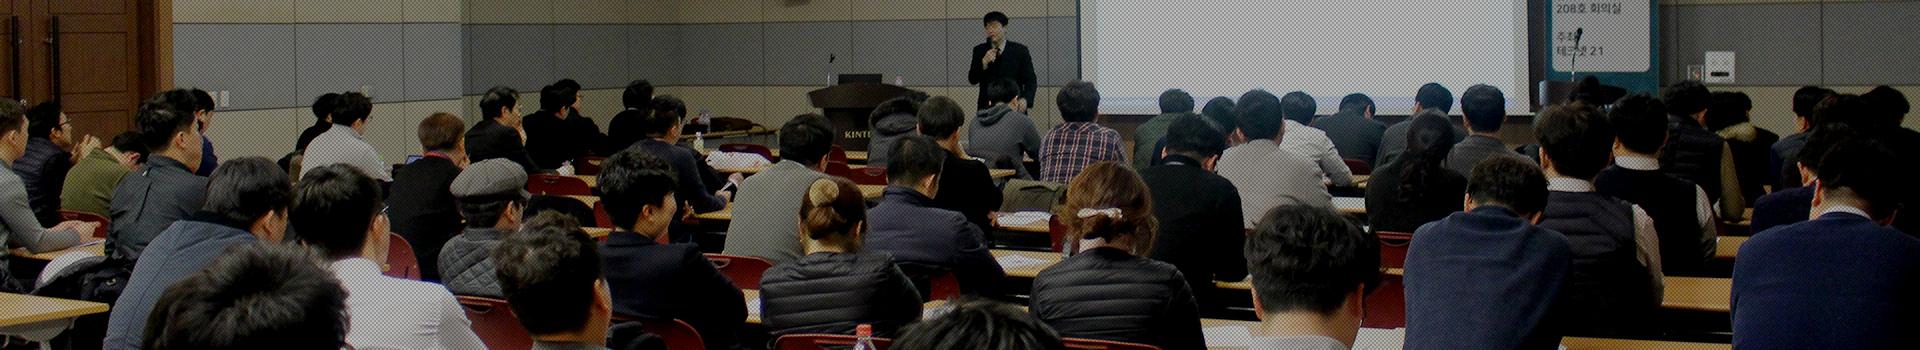 seminar_top_visual_bg